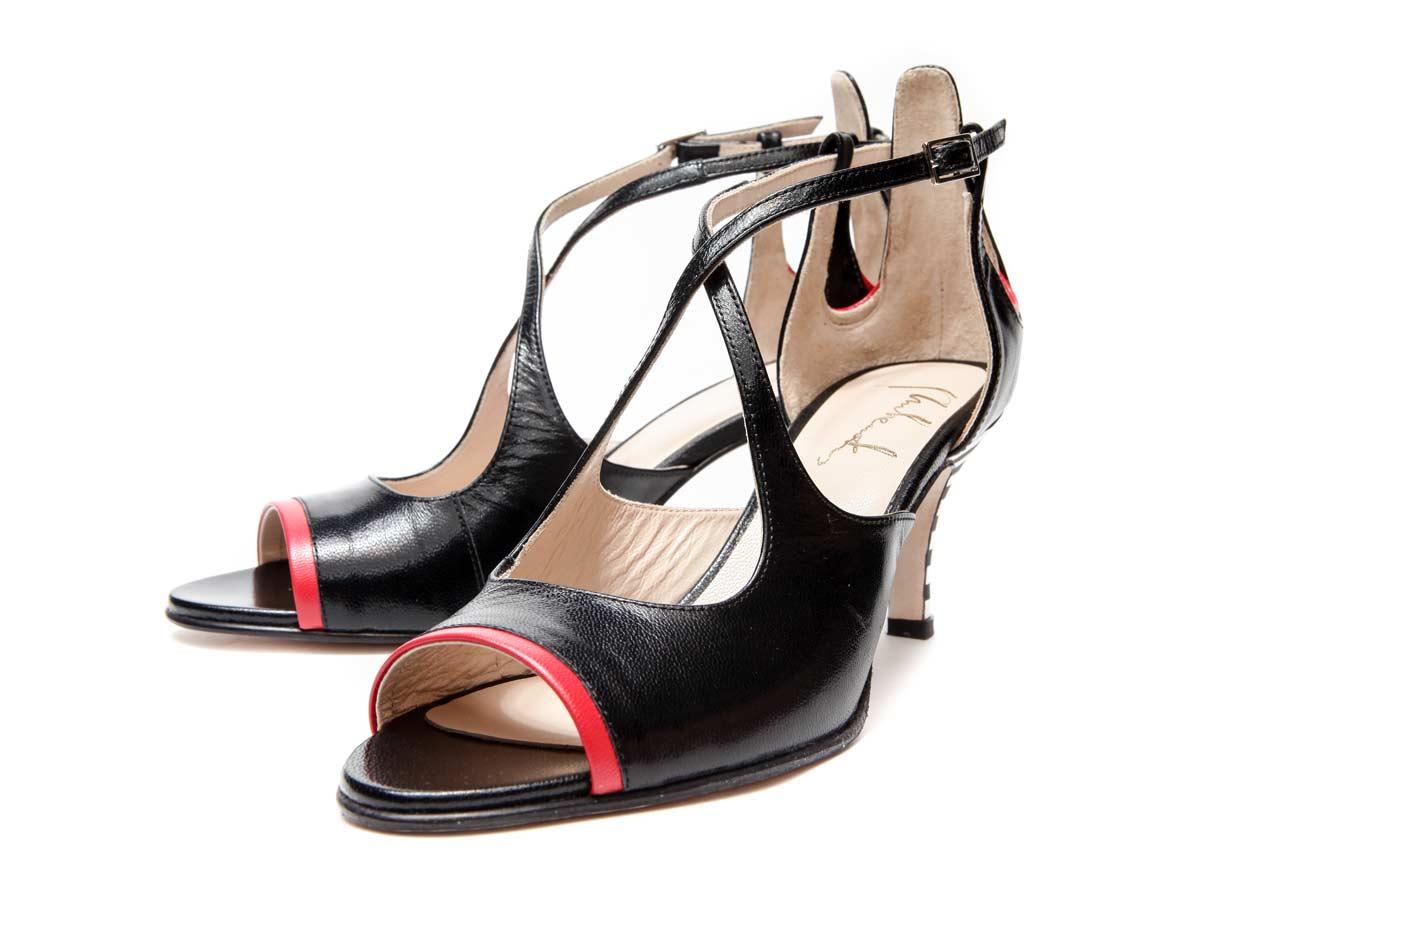 Black mid heel strappy sandals